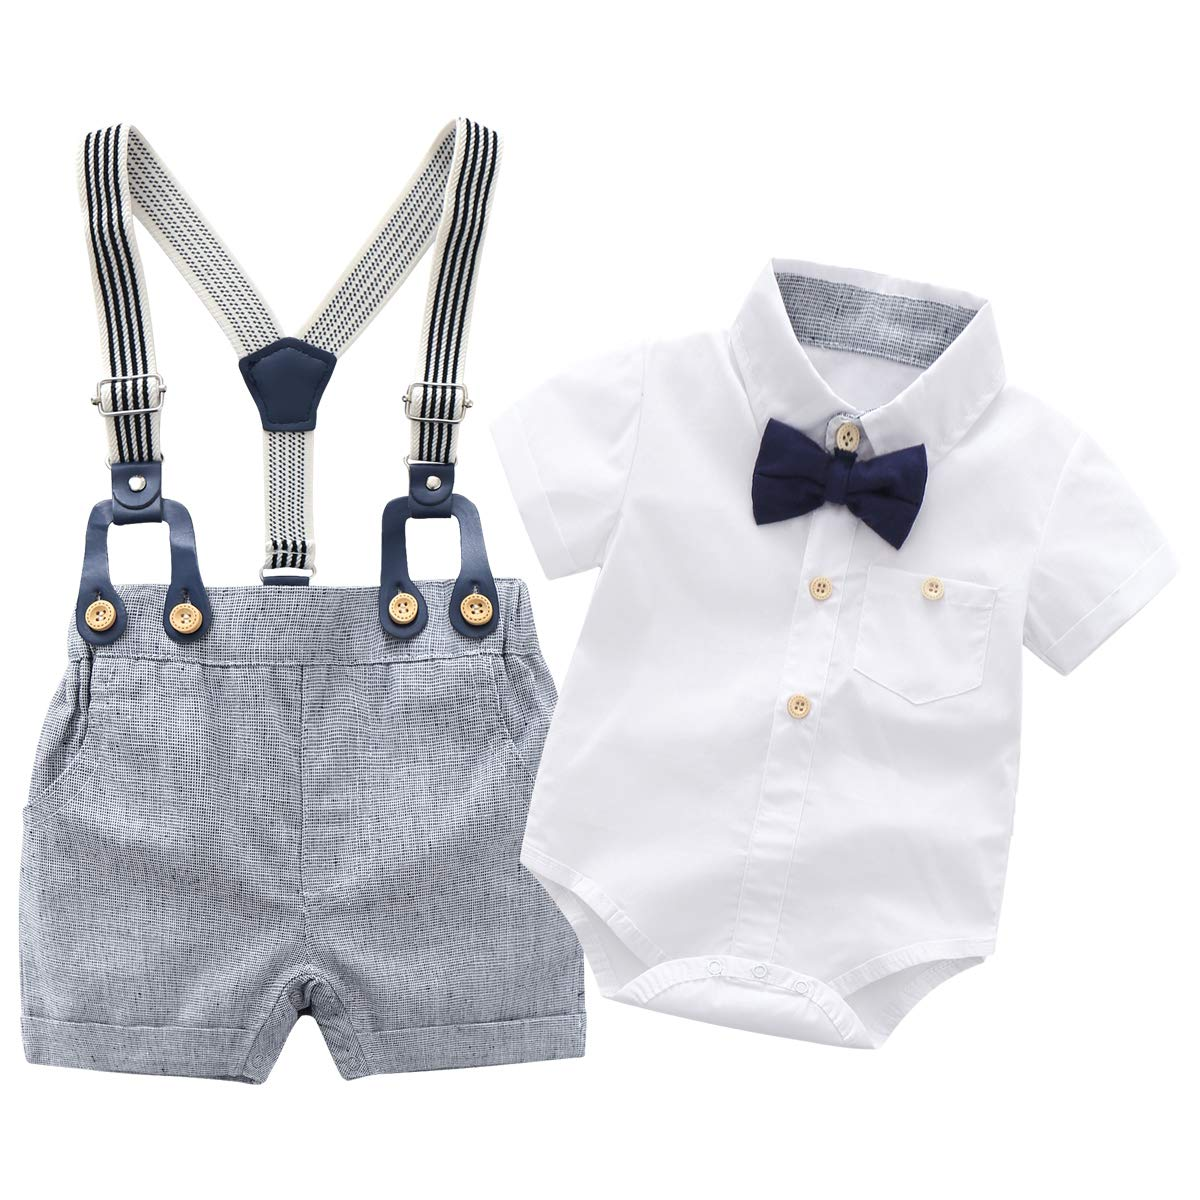 BBKidss Baby Boys Gentleman Romper Outfit Summer Short Sleeve Cotton Onesie Bodysuit with Bow Tie